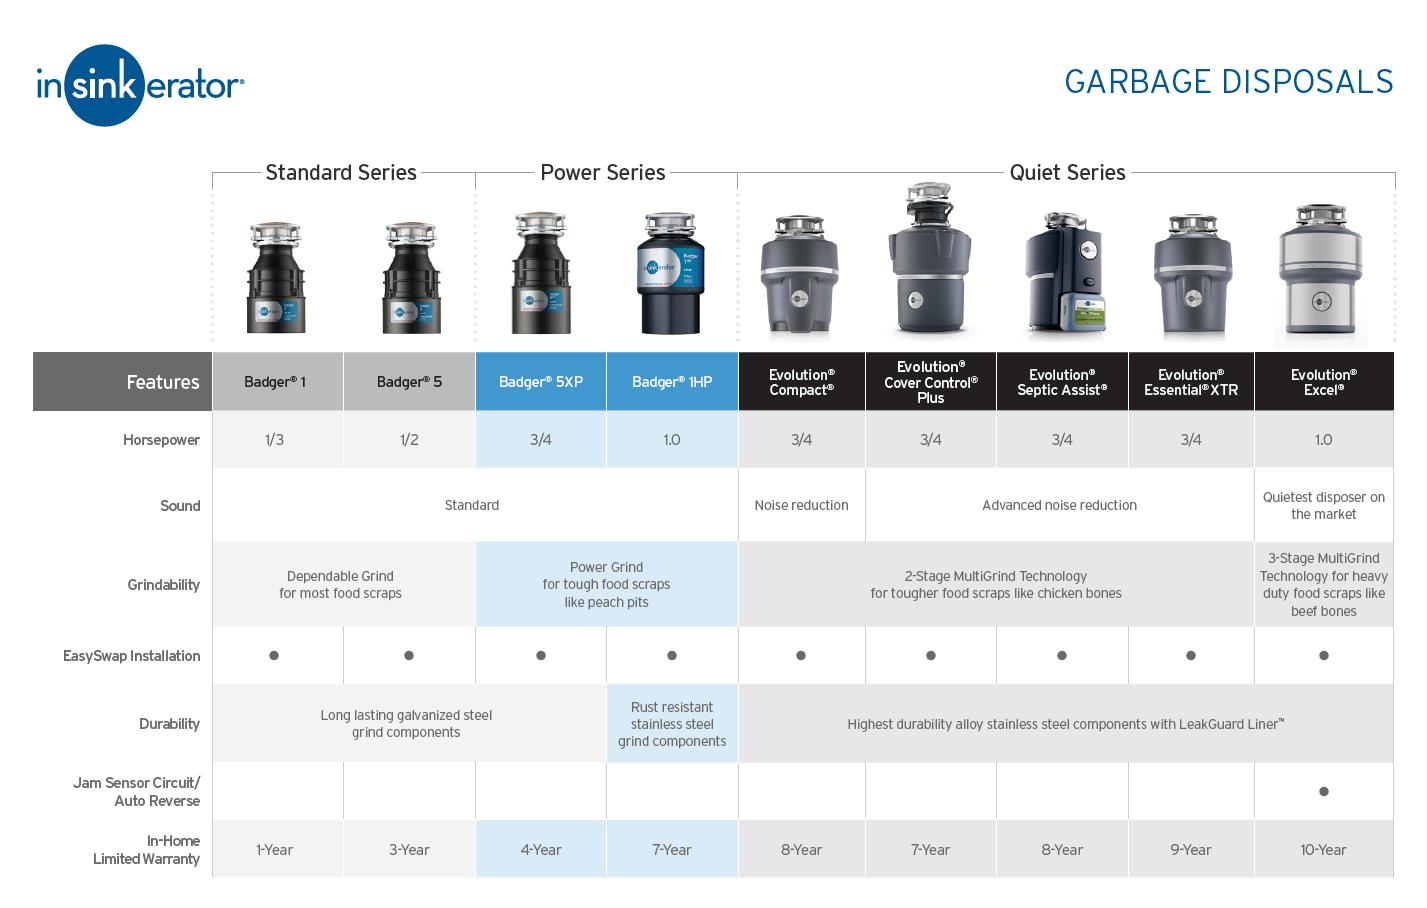 InSinkErator Garbage Disposal Comparison Chart   InSinkErator US